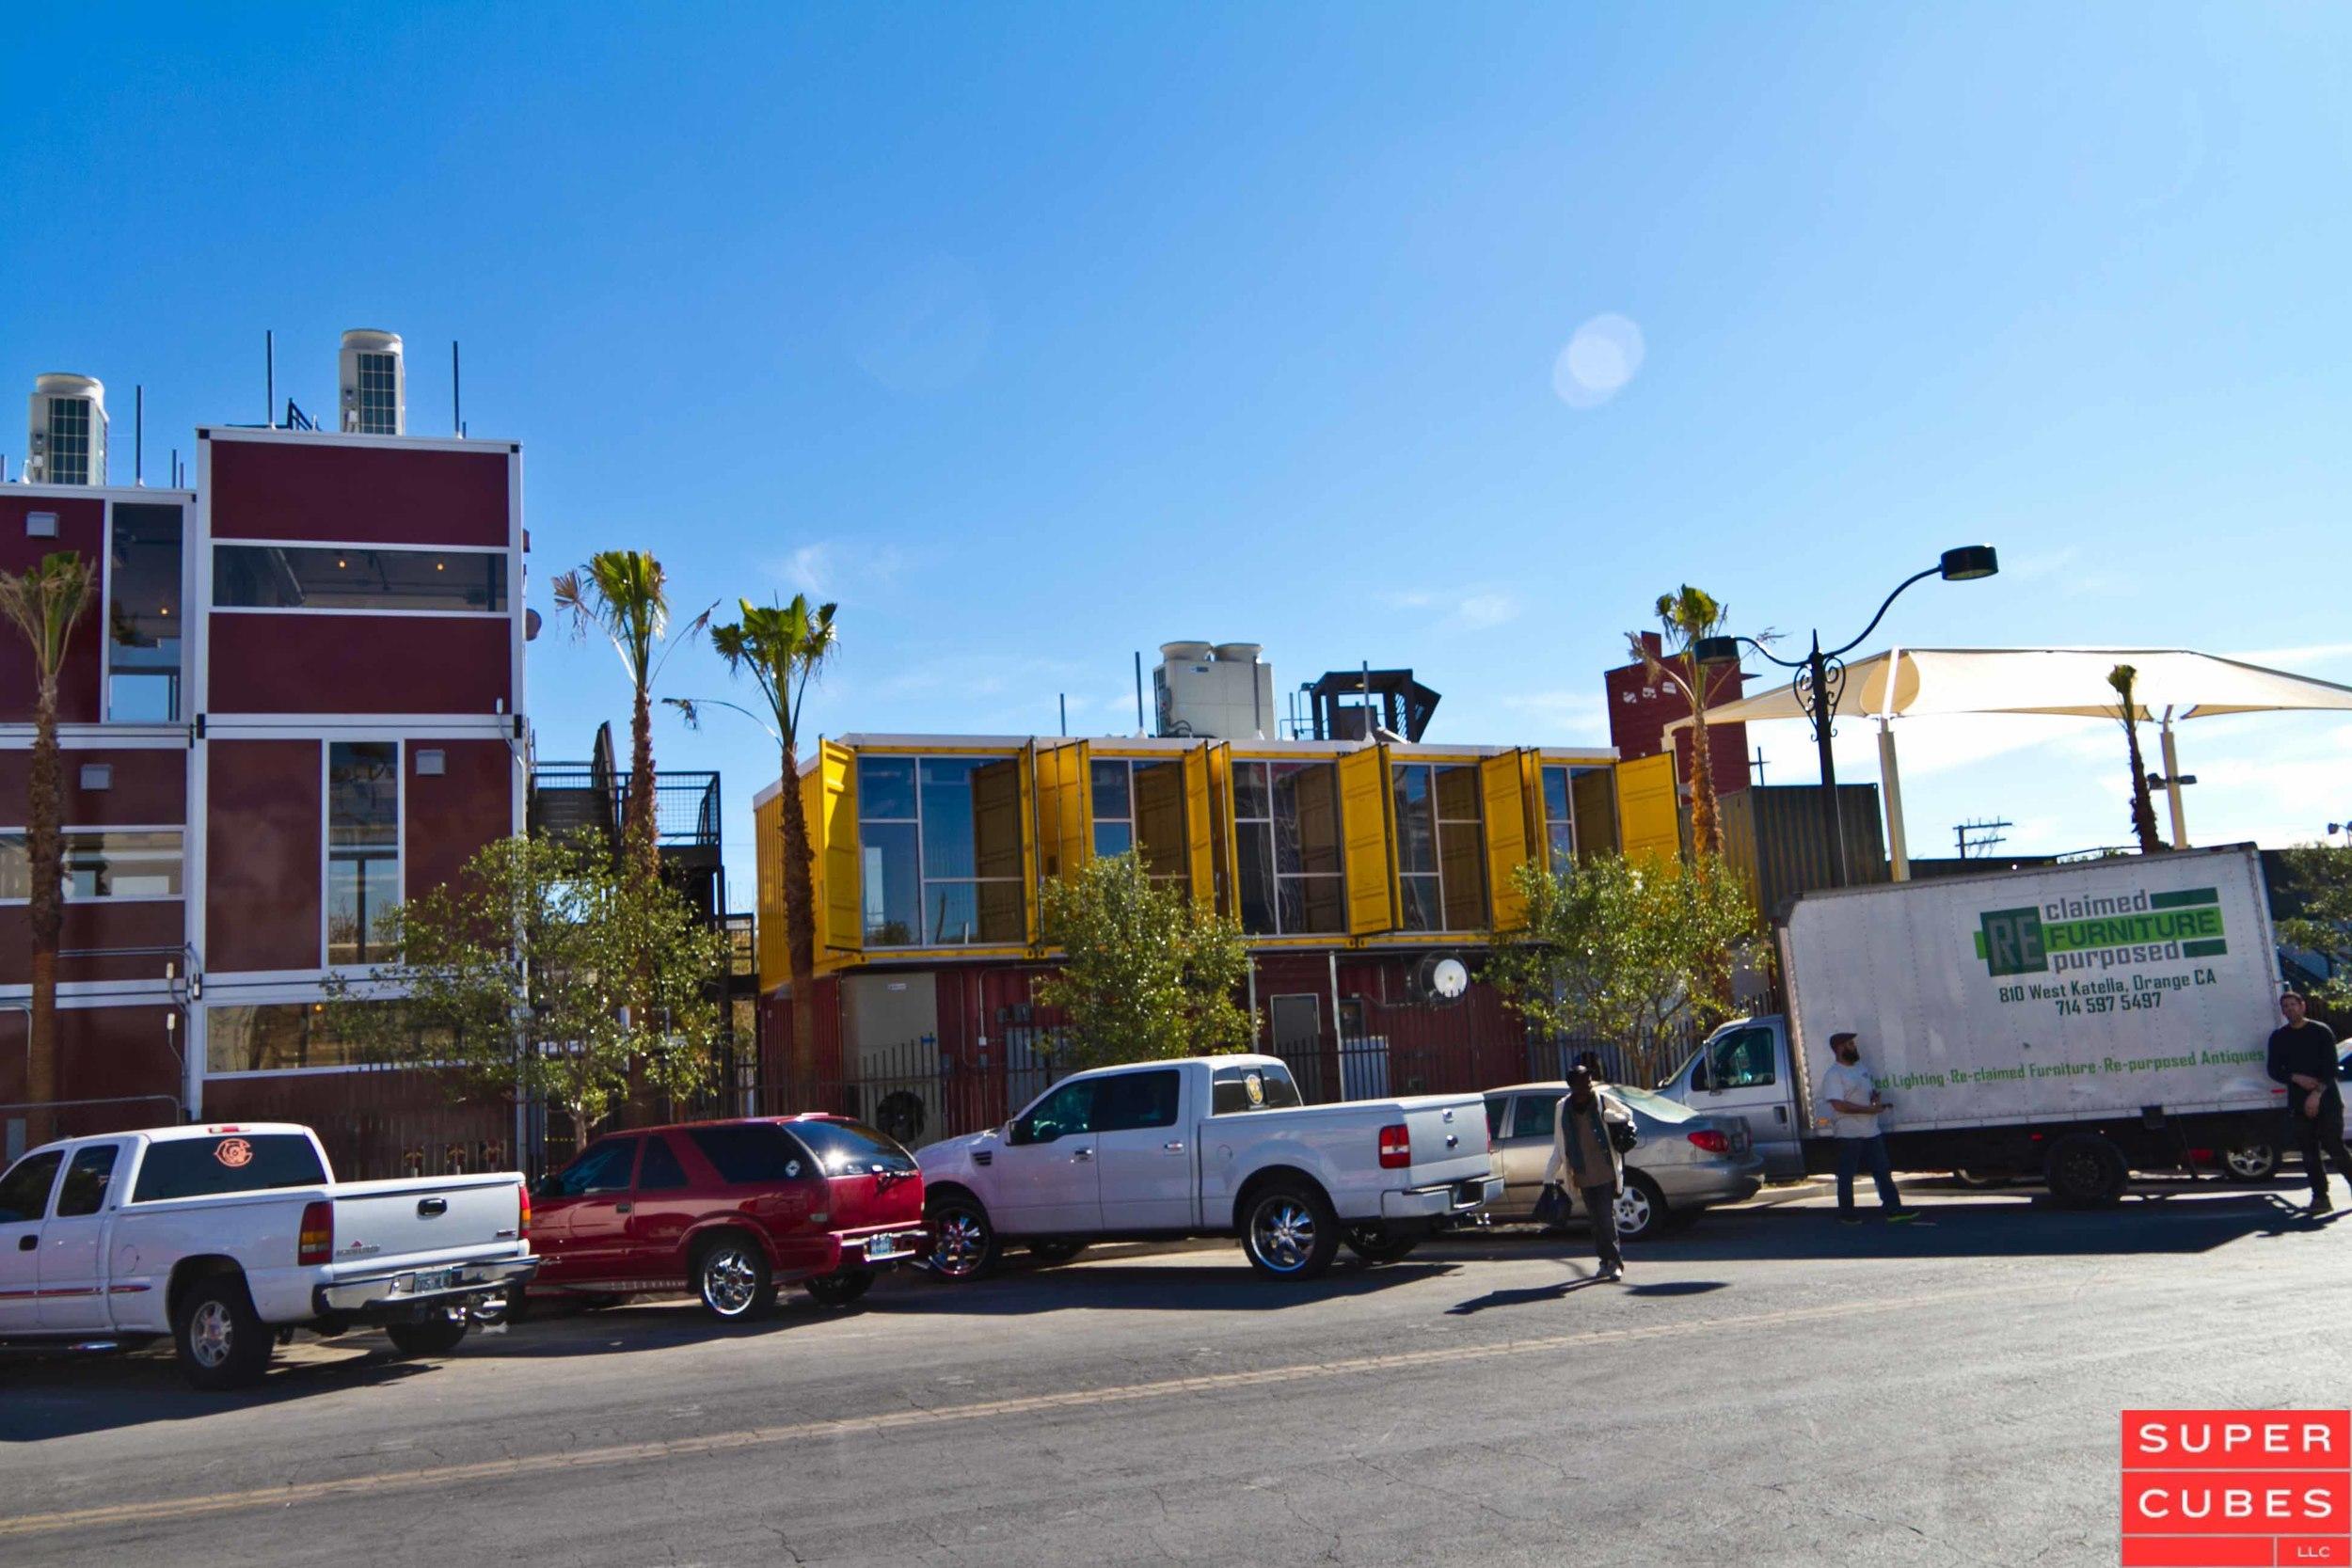 2013 Las Vegas Downtown Container Market-3.jpg